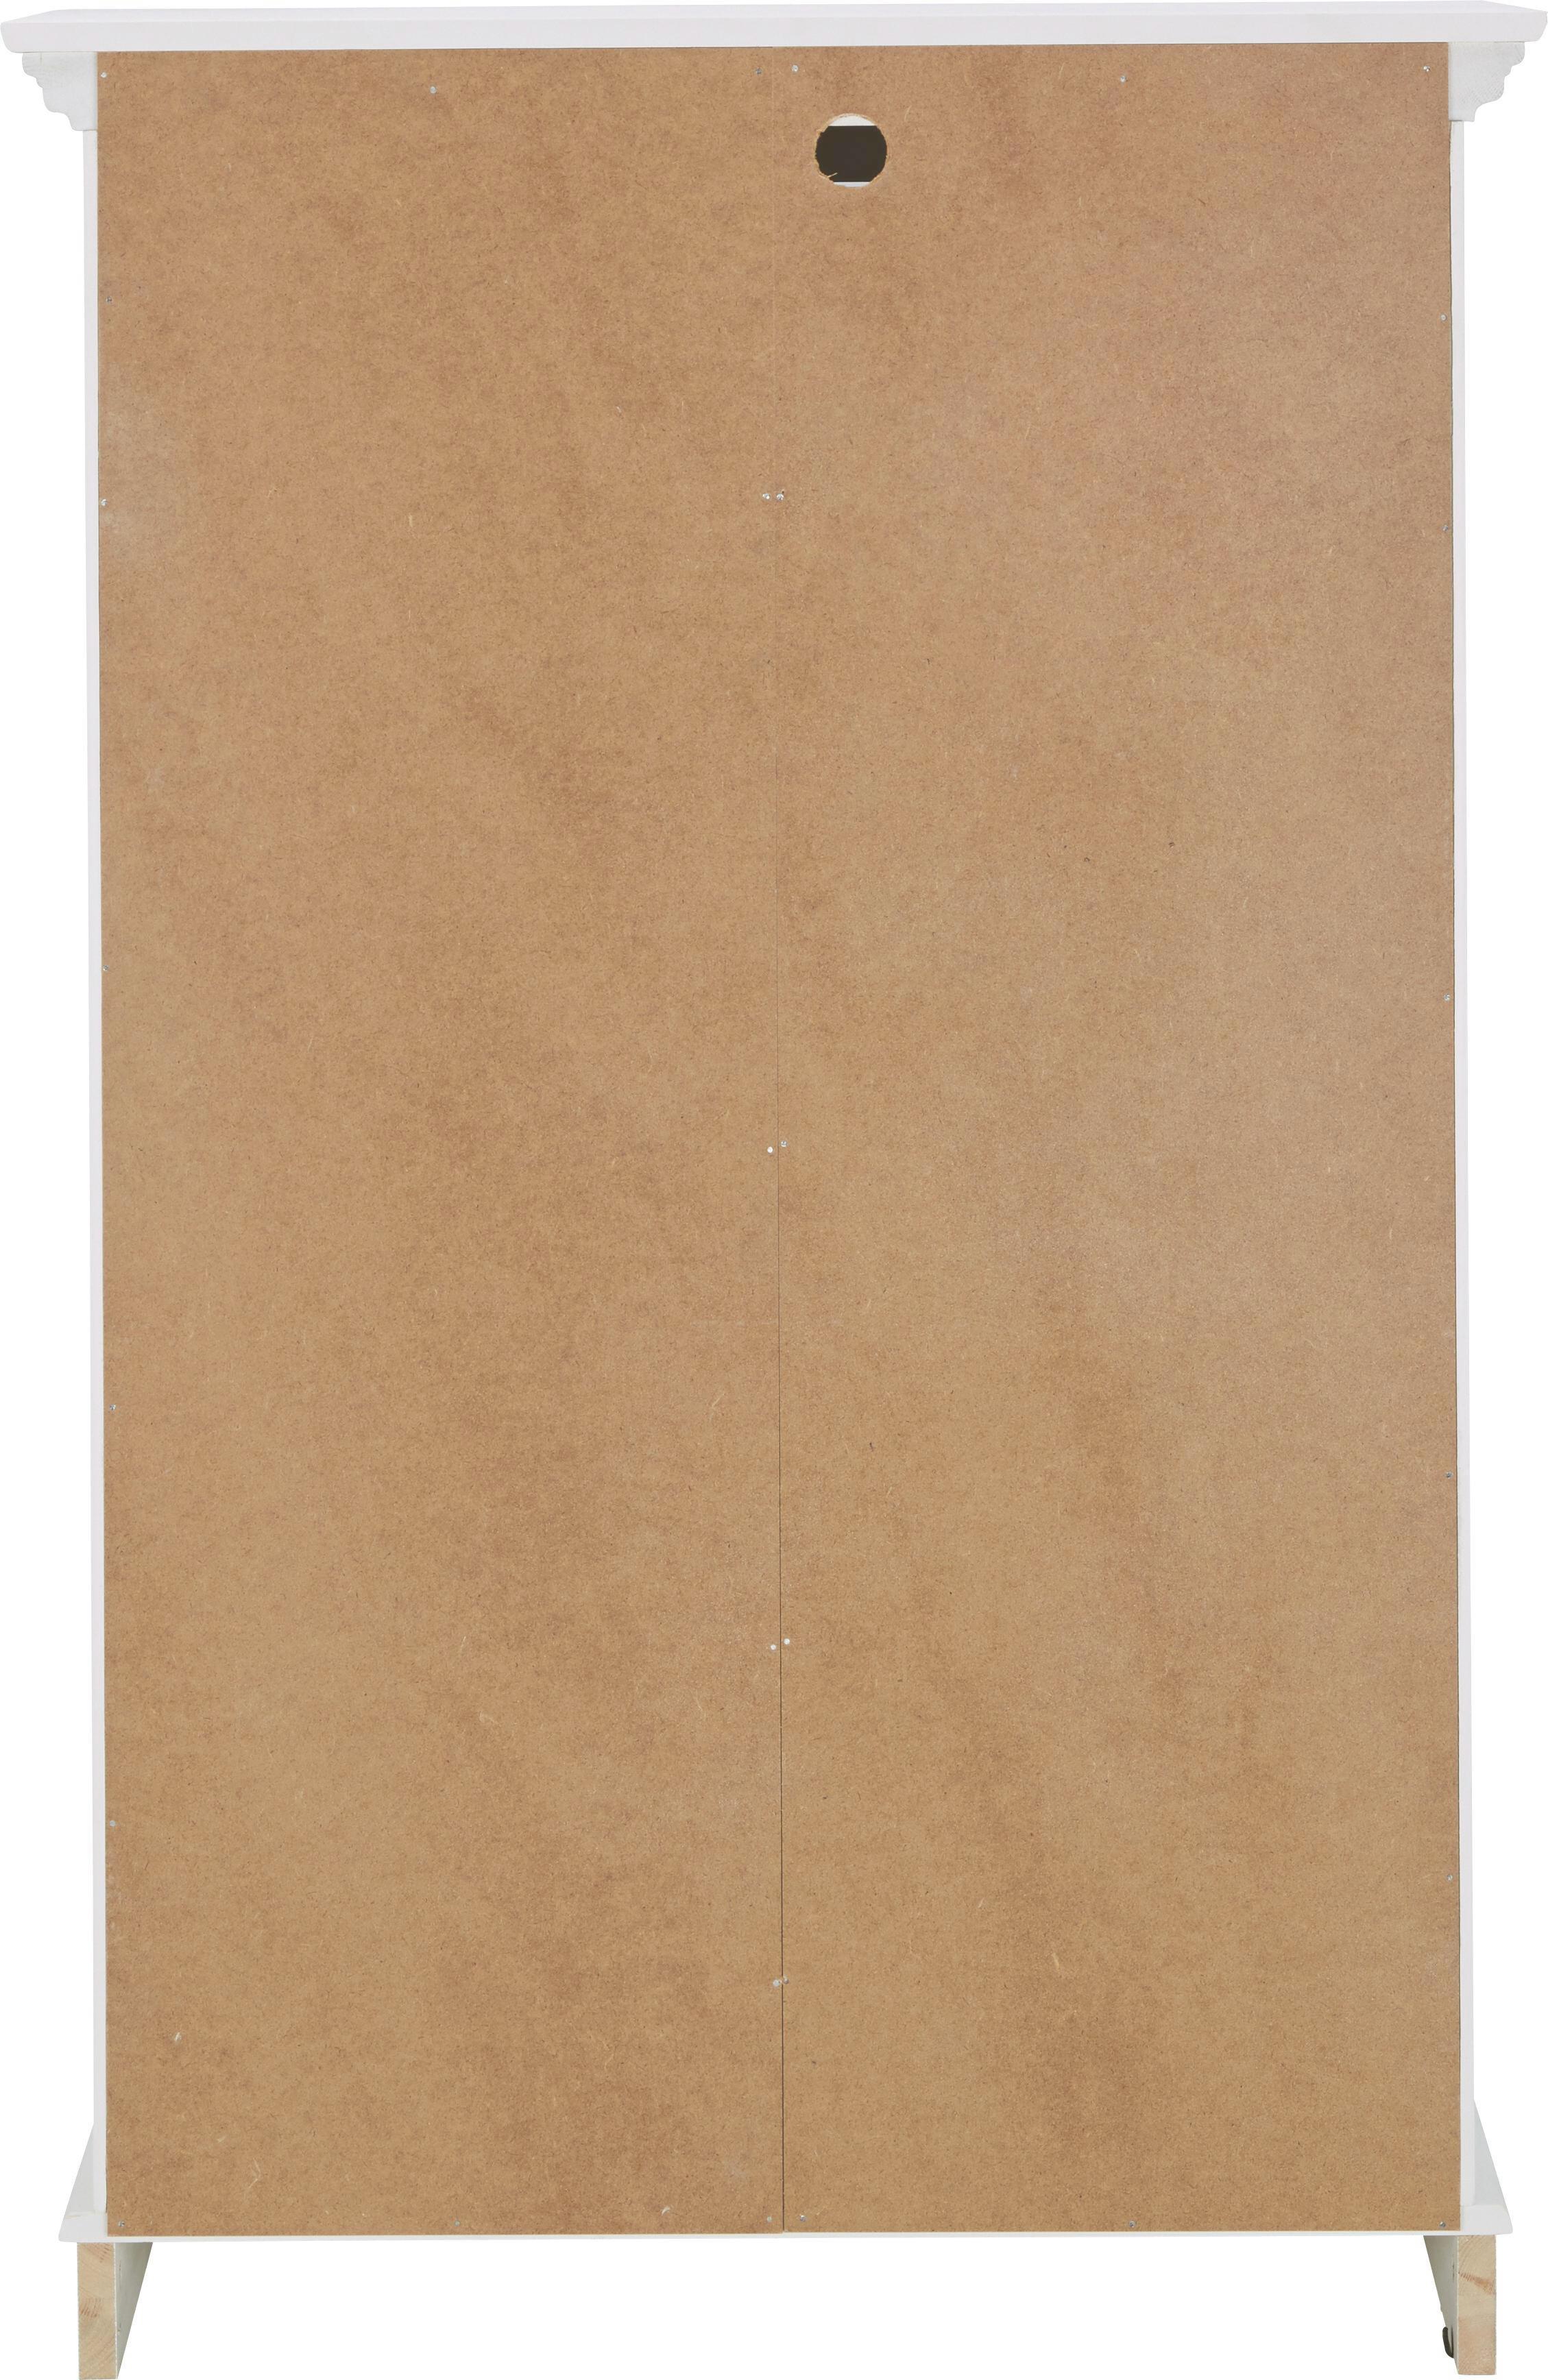 Highboard Claudia - Weiß, KONVENTIONELL, Glas/Holz (79/120/44,5cm) - PREMIUM LIVING